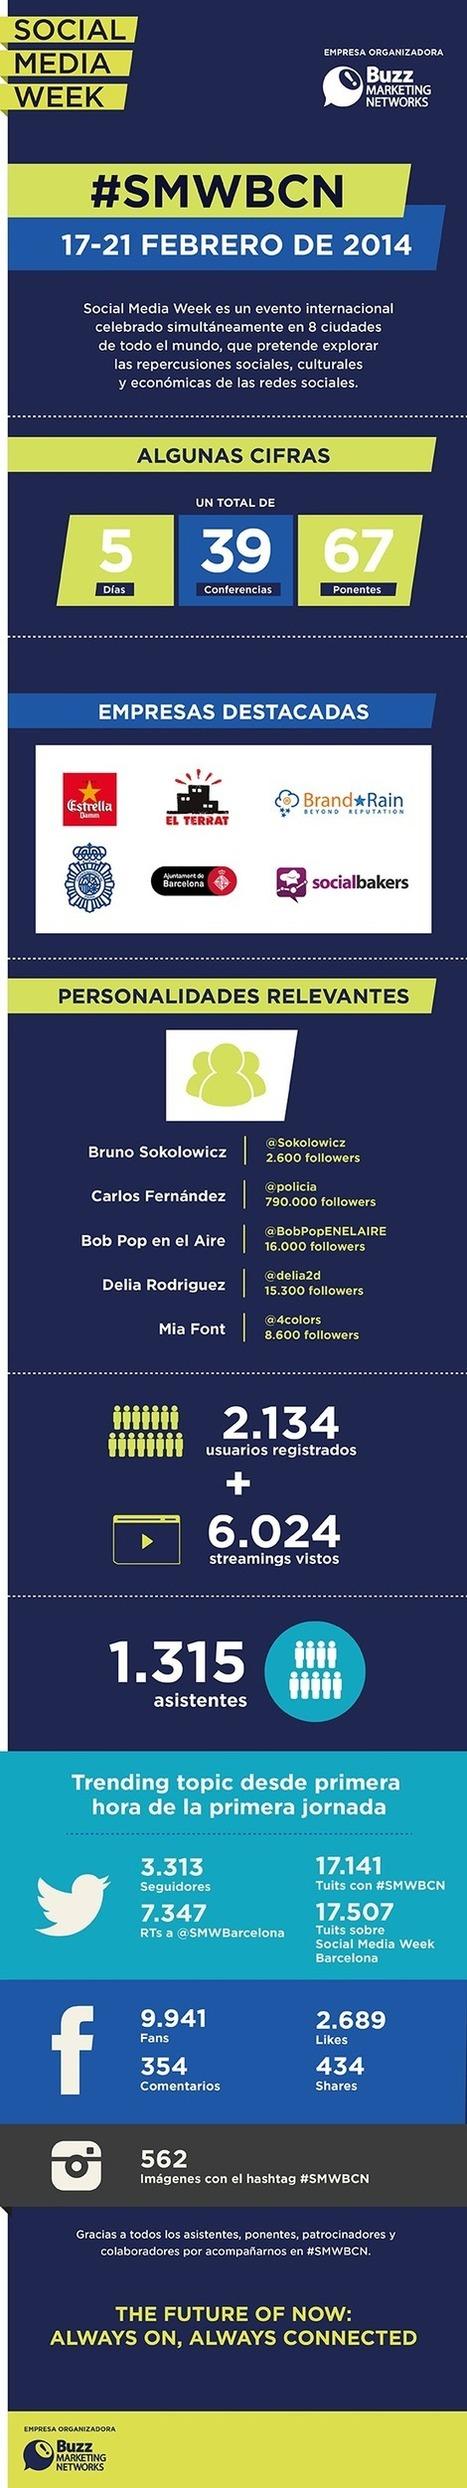 Social Media Week Barcelona 2014 en cifras [Infografía] | Social media y Community Manager | Scoop.it